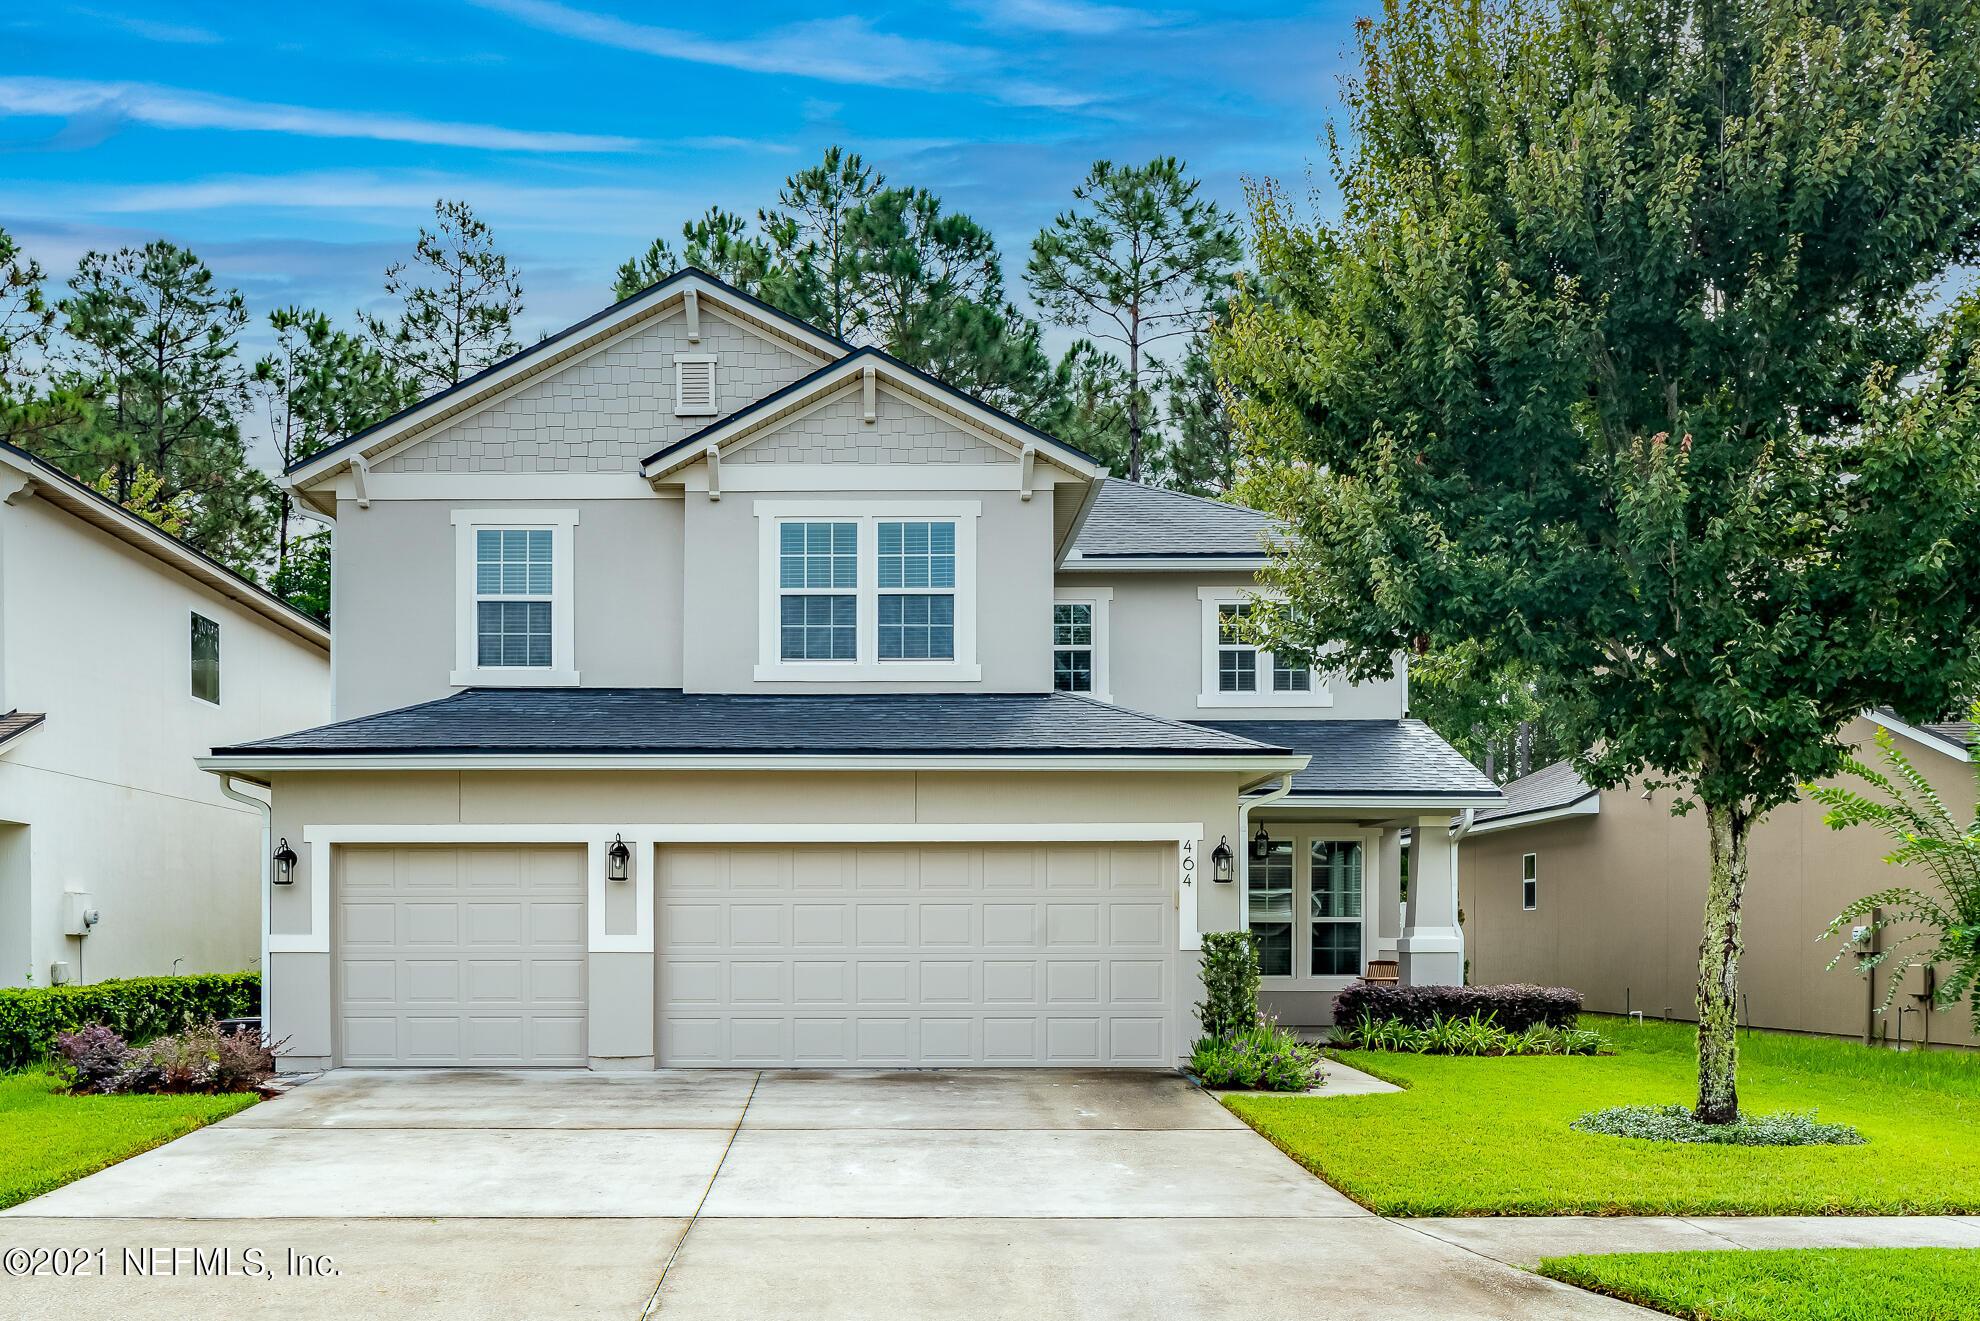 464 GLENDALE, ORANGE PARK, FLORIDA 32065, 5 Bedrooms Bedrooms, ,2 BathroomsBathrooms,Residential,For sale,GLENDALE,1132696